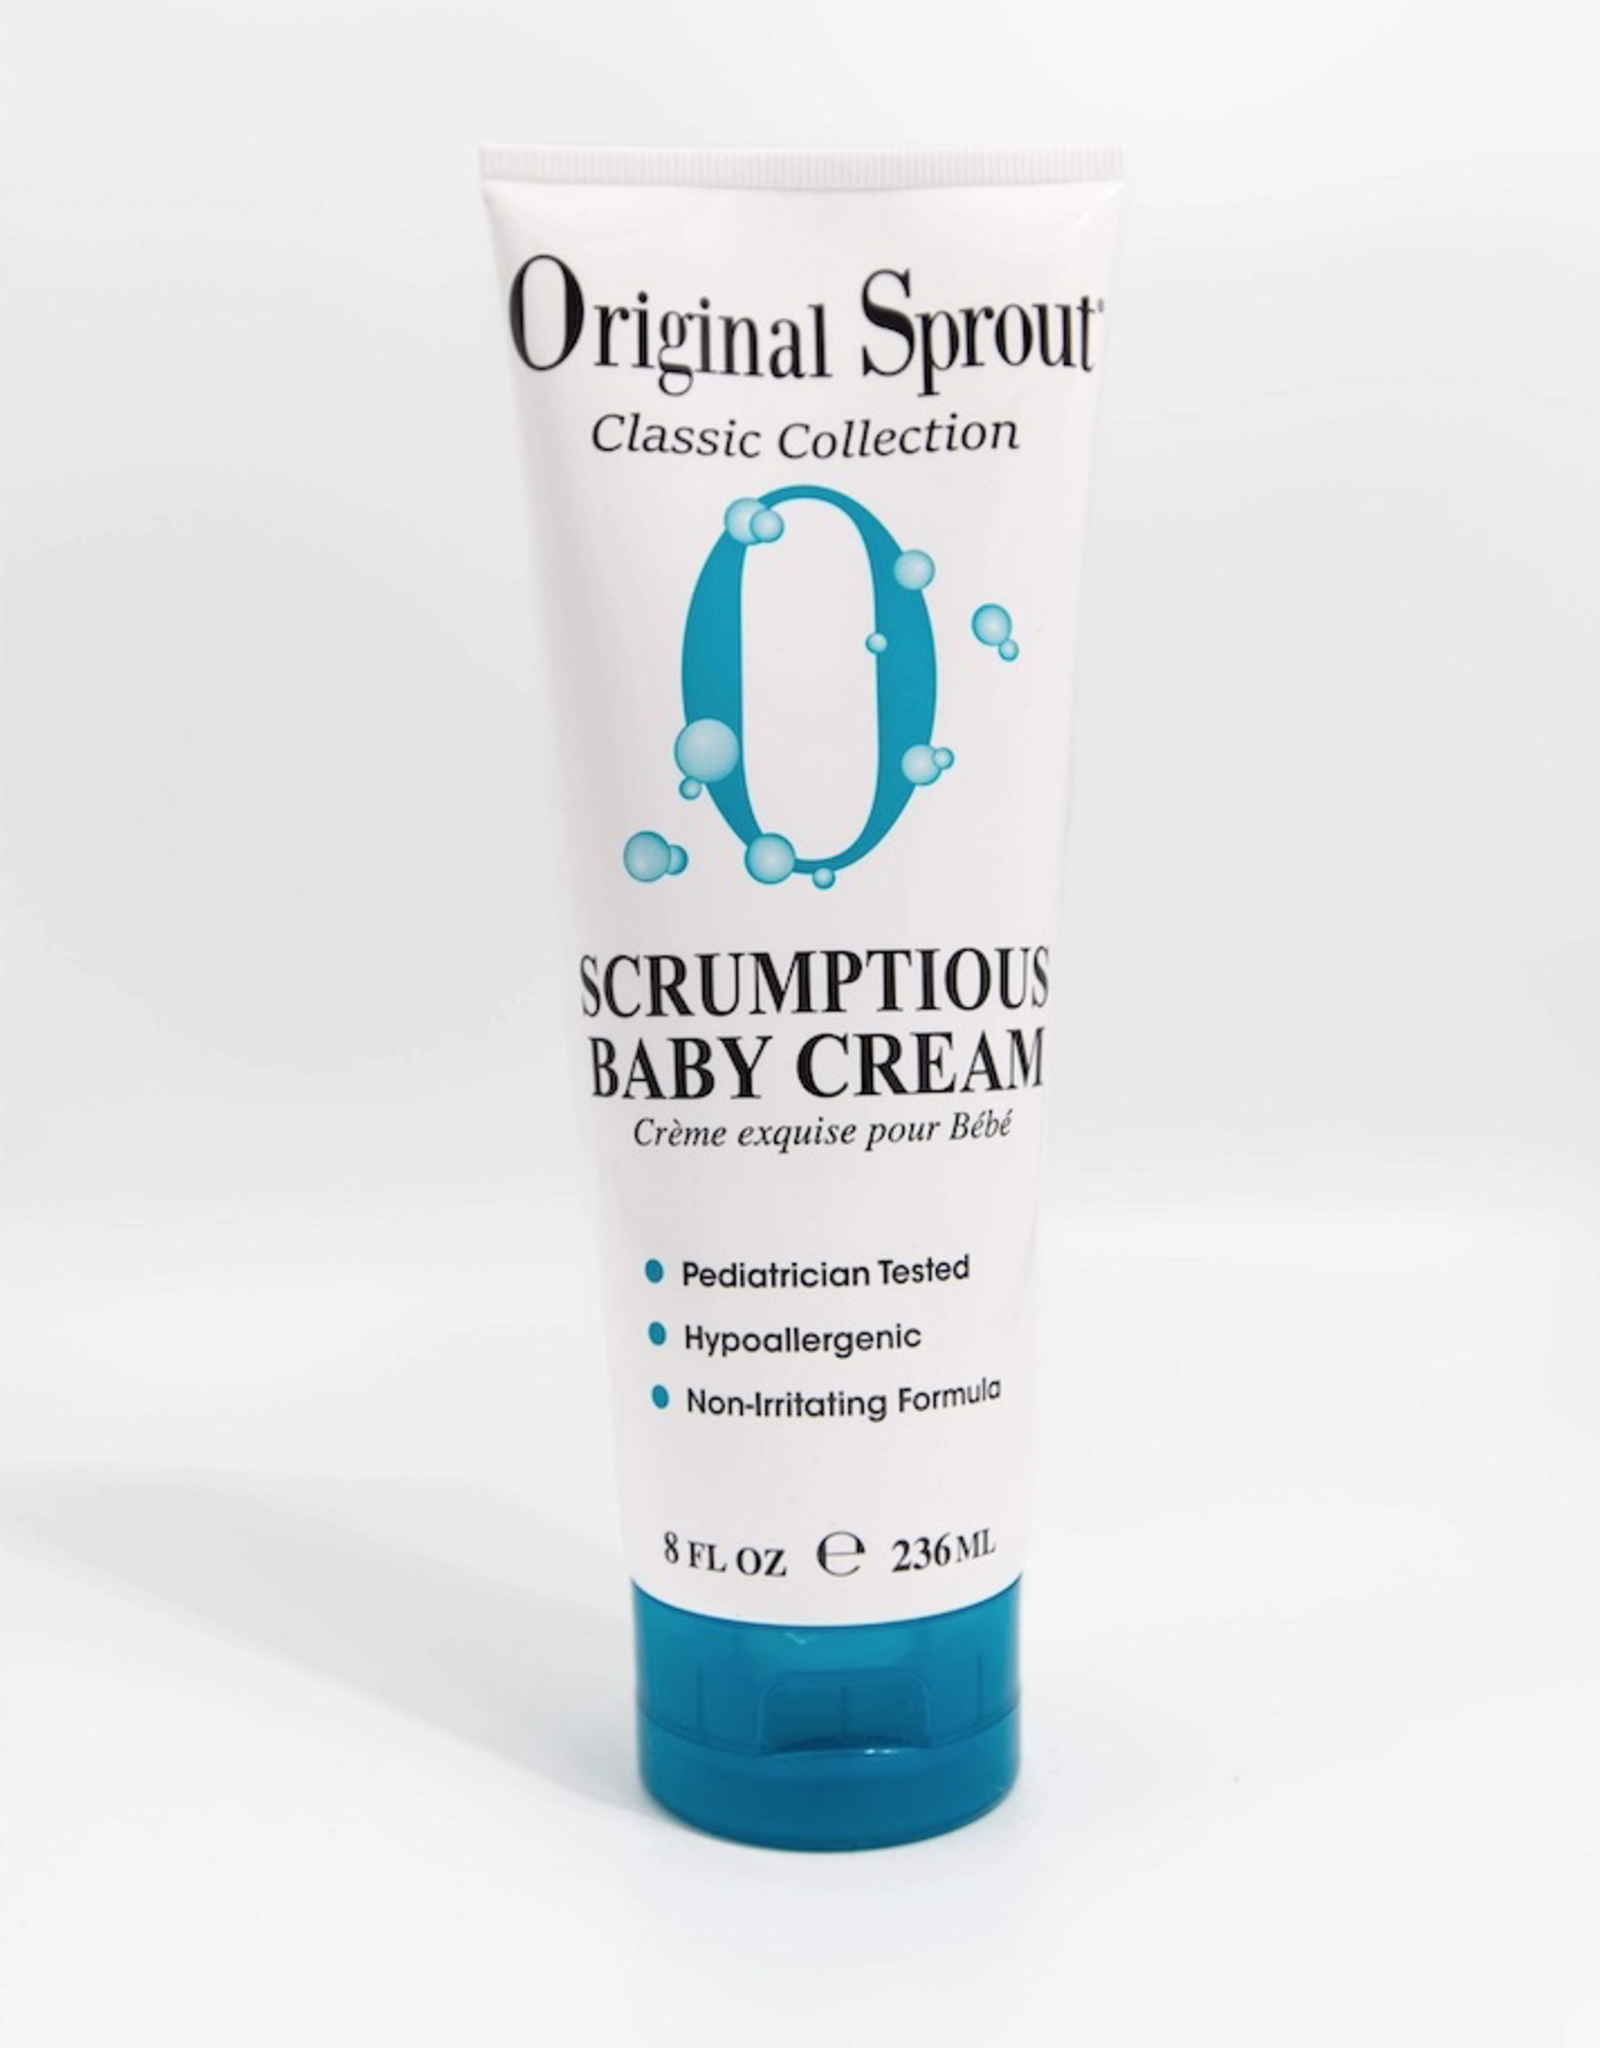 Original Sprout Scrumptious Baby Cream 8oz